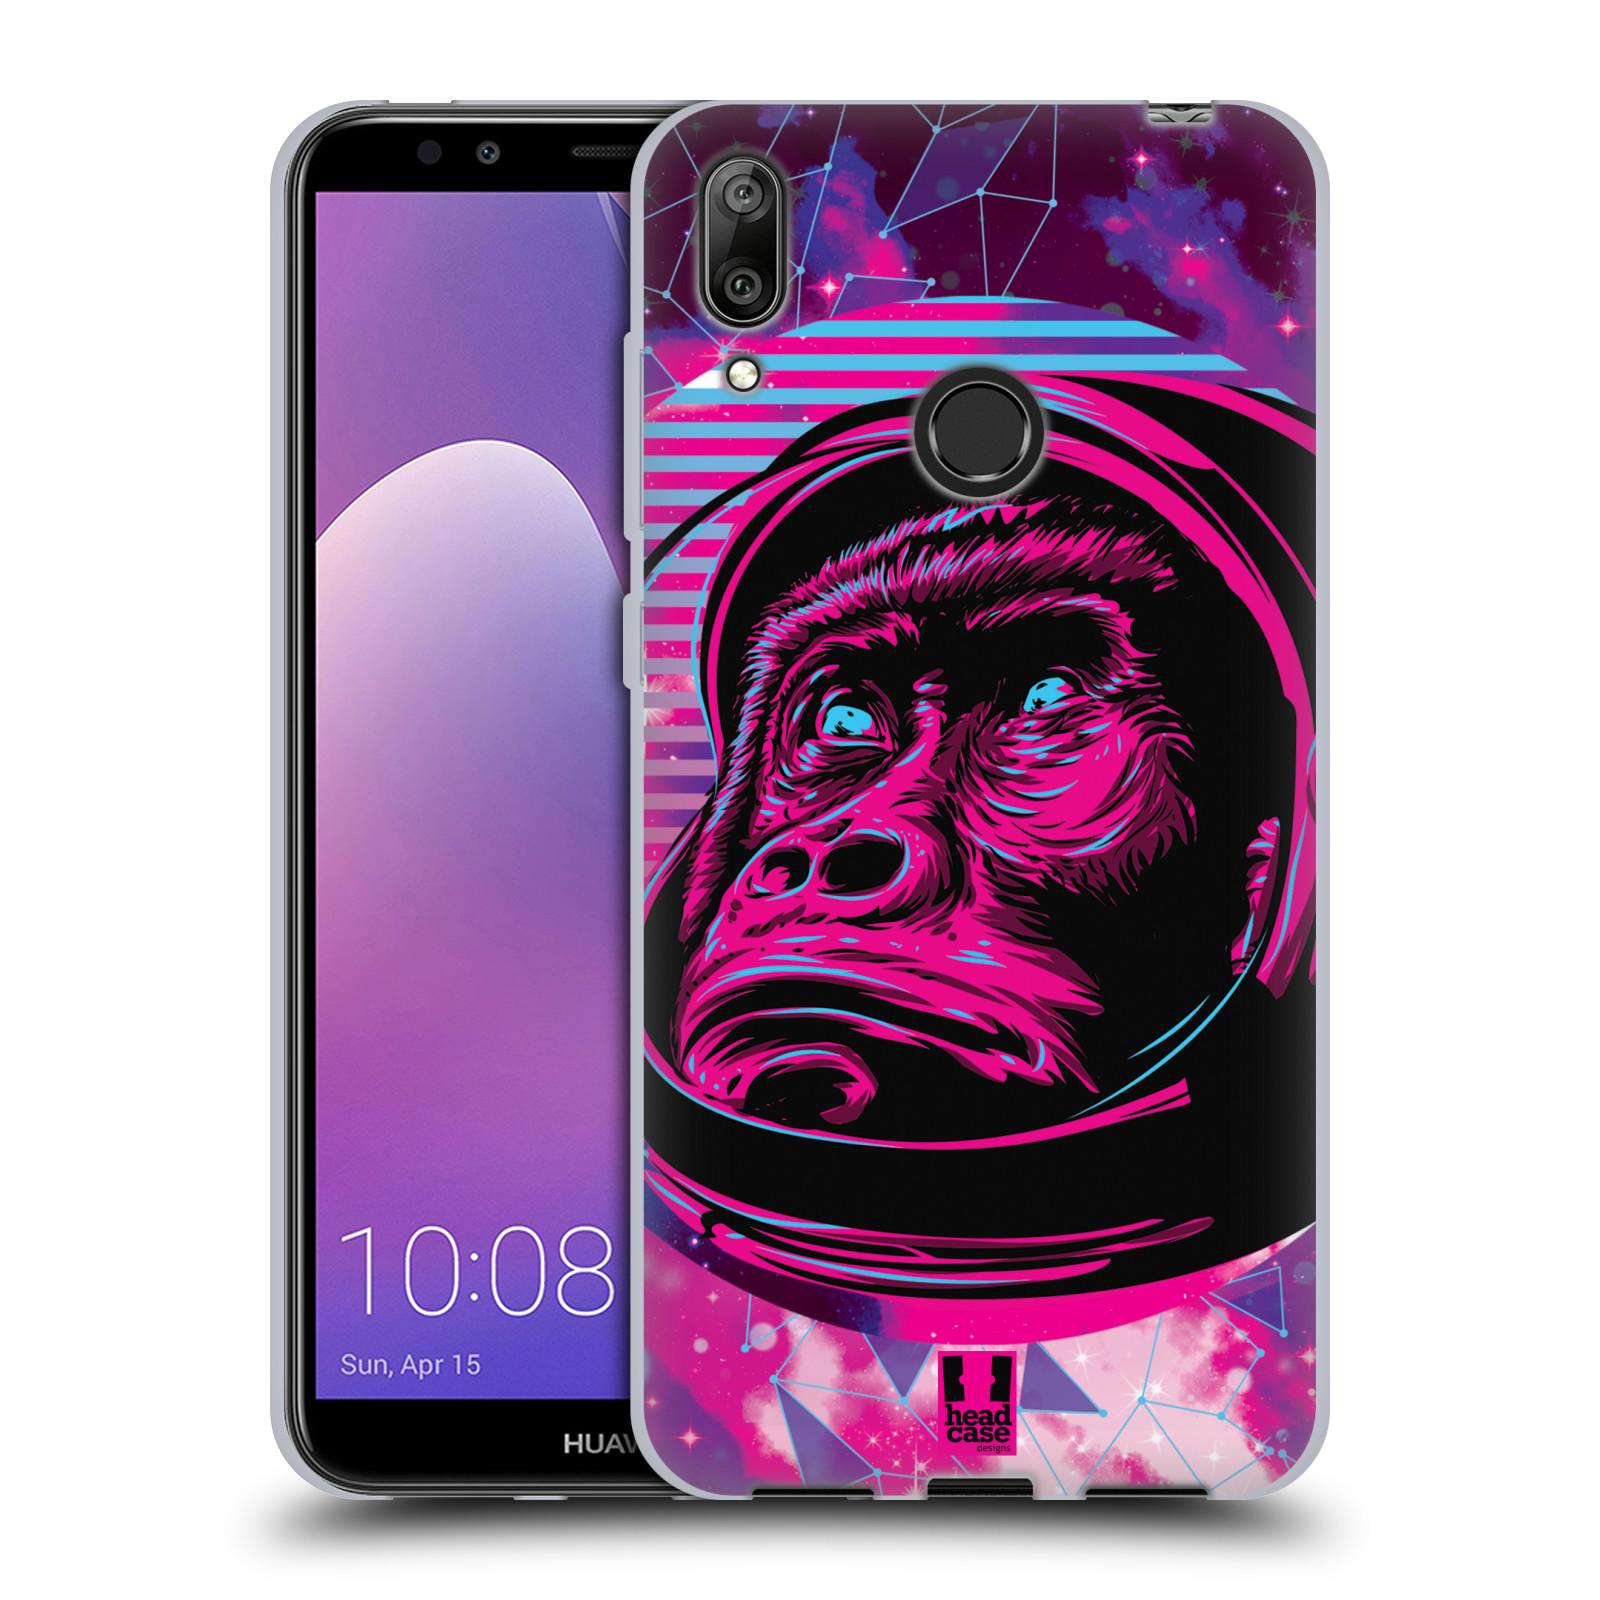 Silikonové pouzdro na mobil Huawei Y7 (2019) - Head Case - Gorila ve skafandru